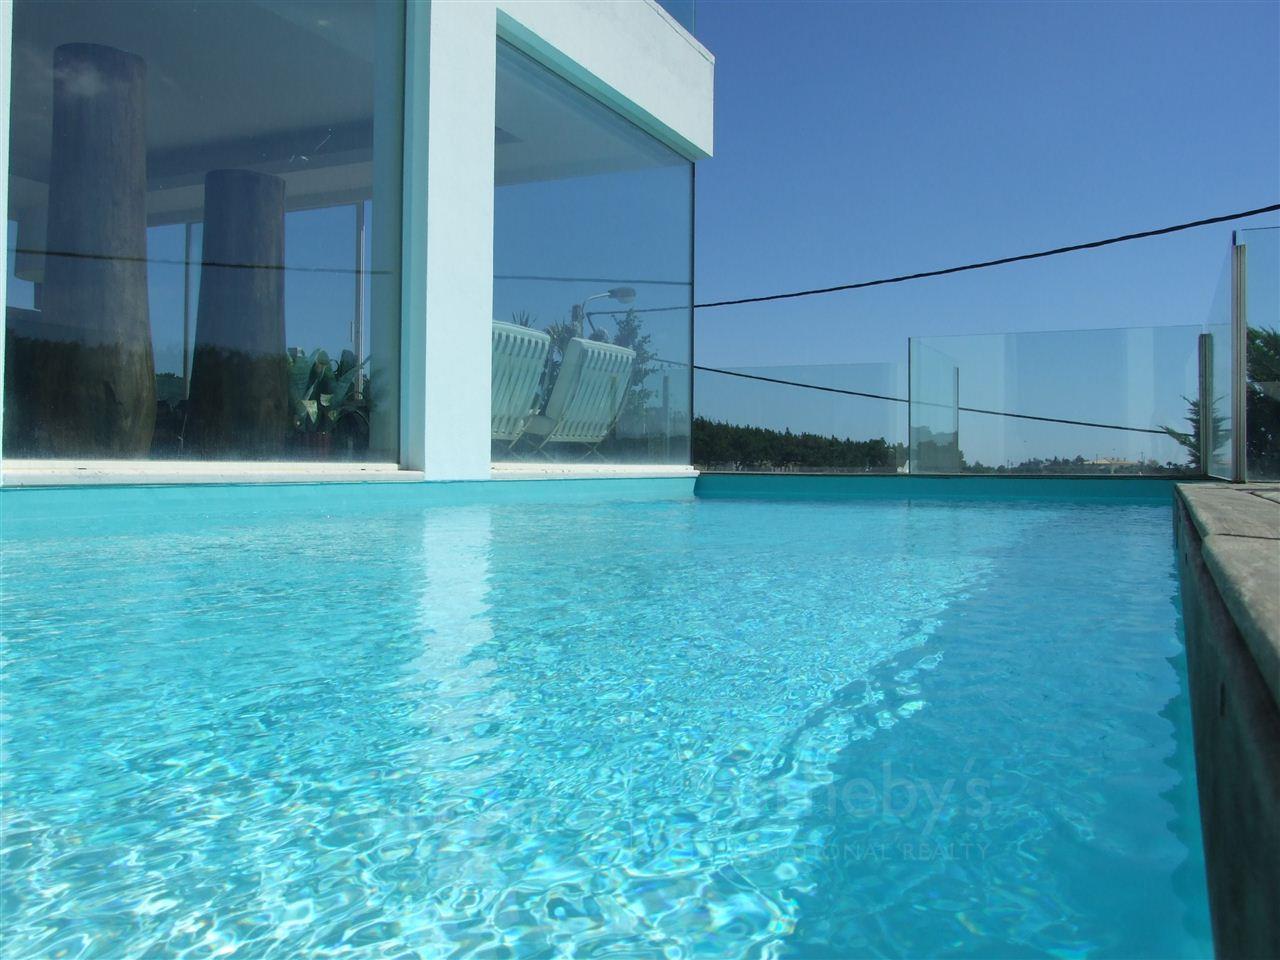 Villa per Vendita alle ore Detached house, 4 bedrooms, for Sale Malveira Serra, Cascais, Lisbona Portogallo